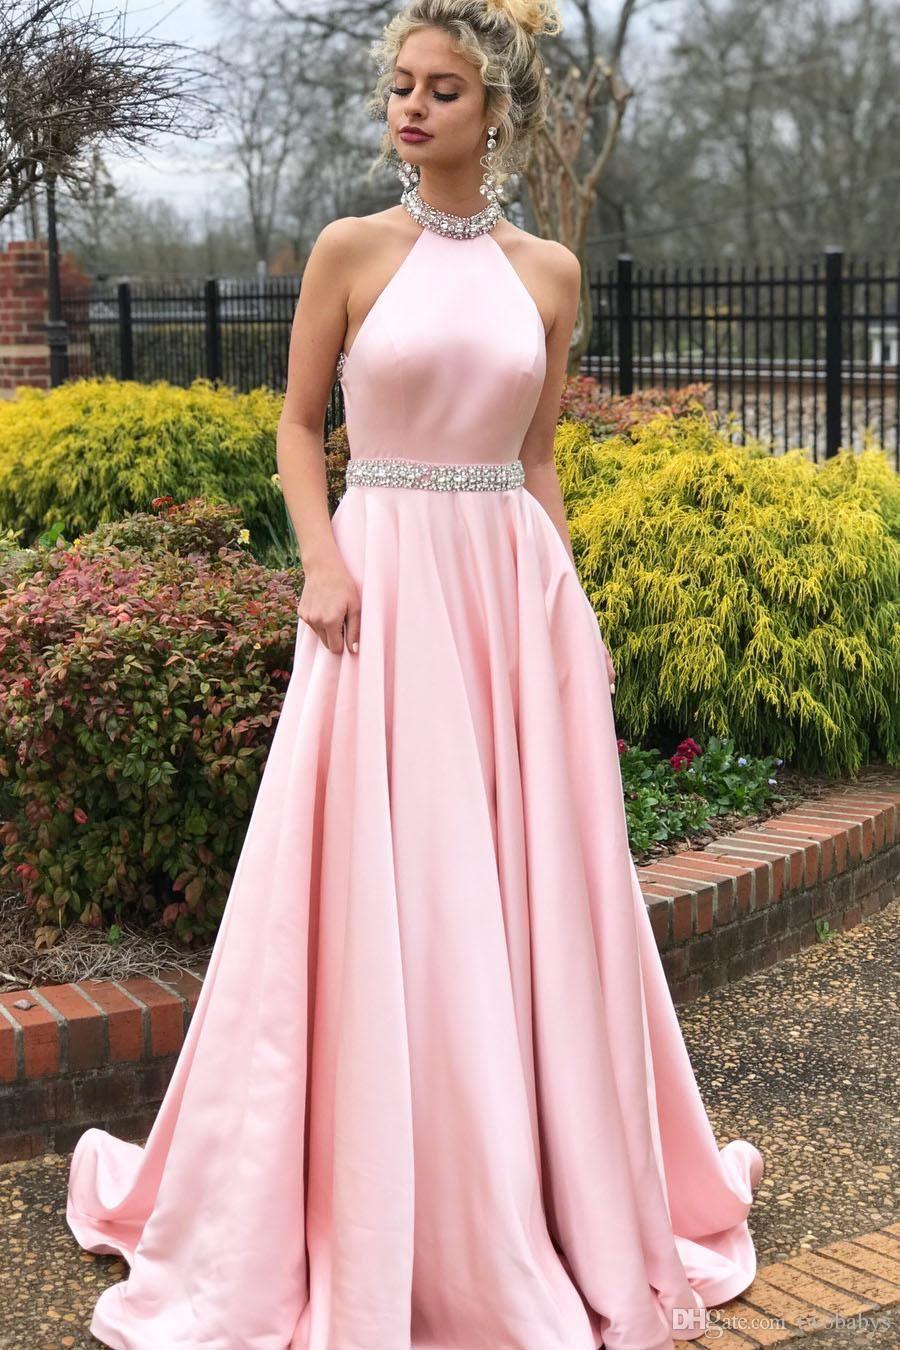 Sleeveless Beaded Crystal Halter Neck Backless Satin Pink Evening Dress vestidos de fiesta Long Graduation Prom Dresses custom-made